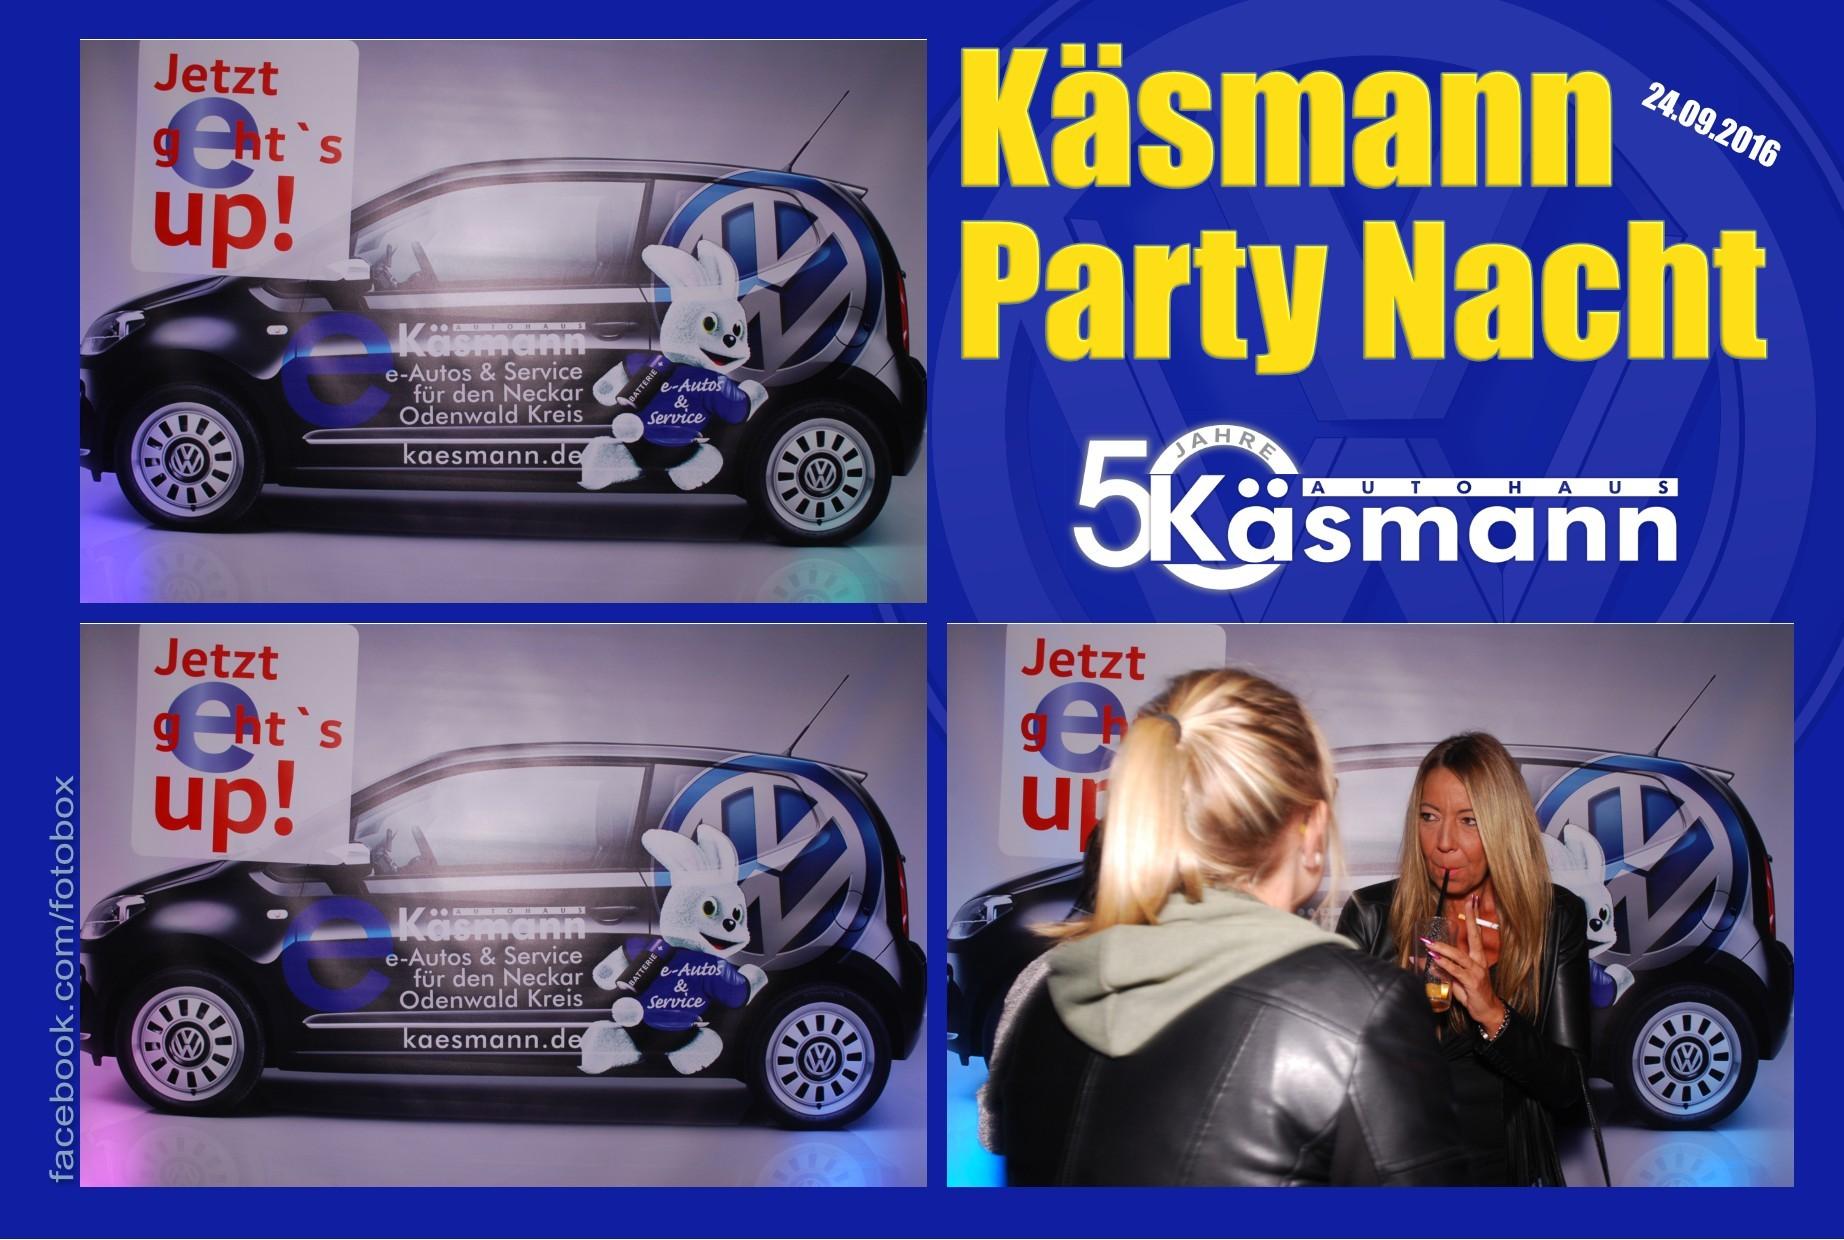 2016-09-24 Käsmann Party -788